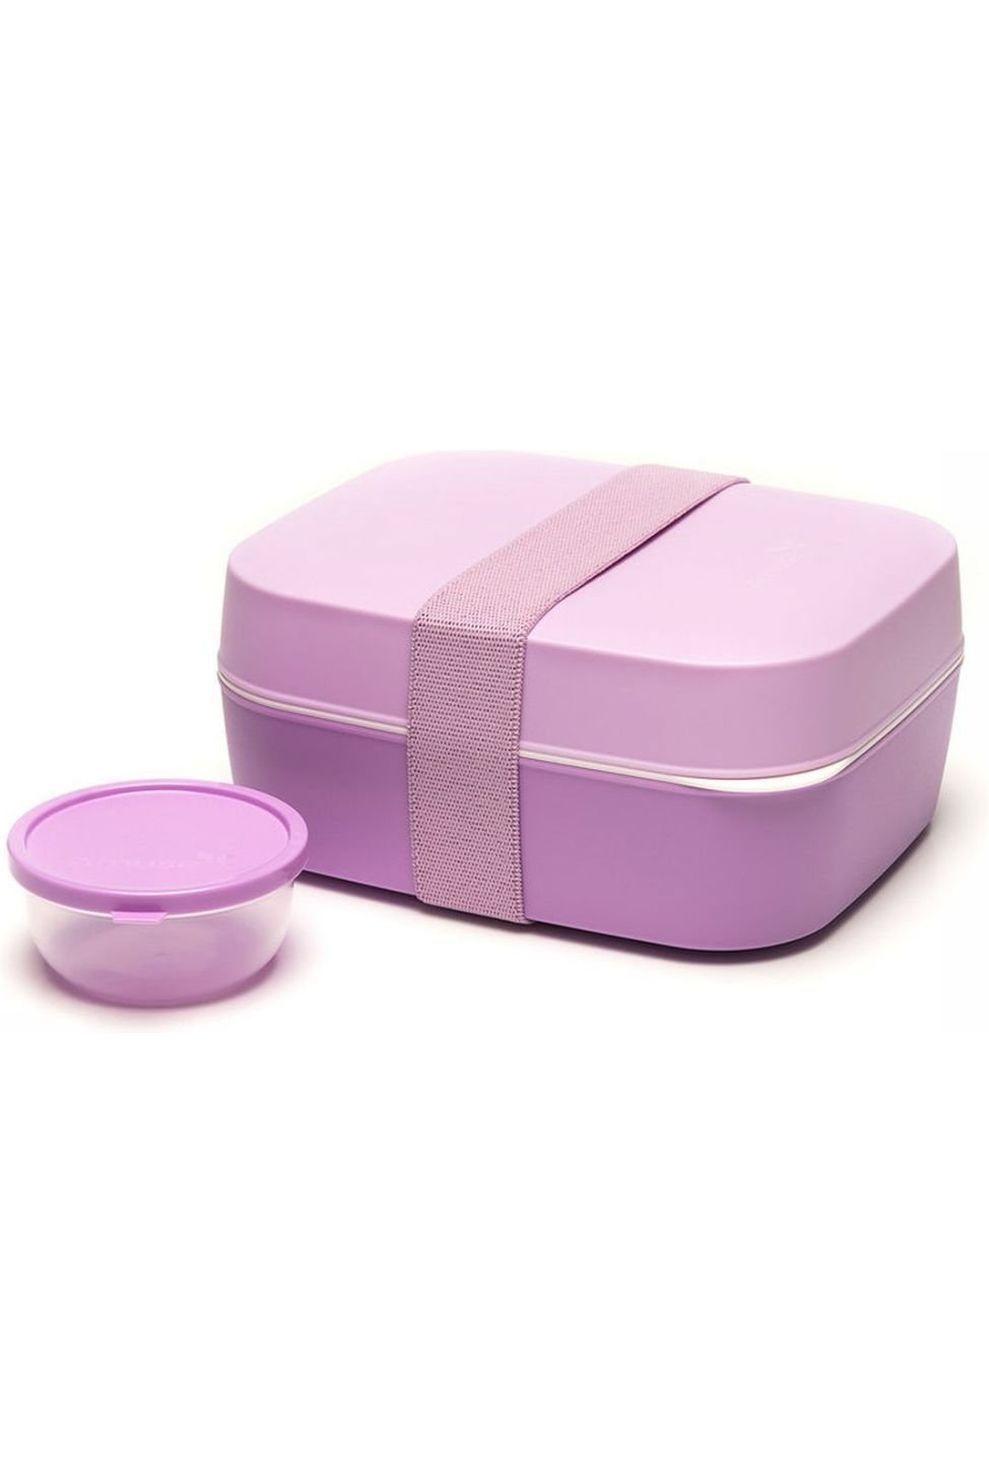 Amuse Voorraadpot Lunchbox 3 in 1 - Roze